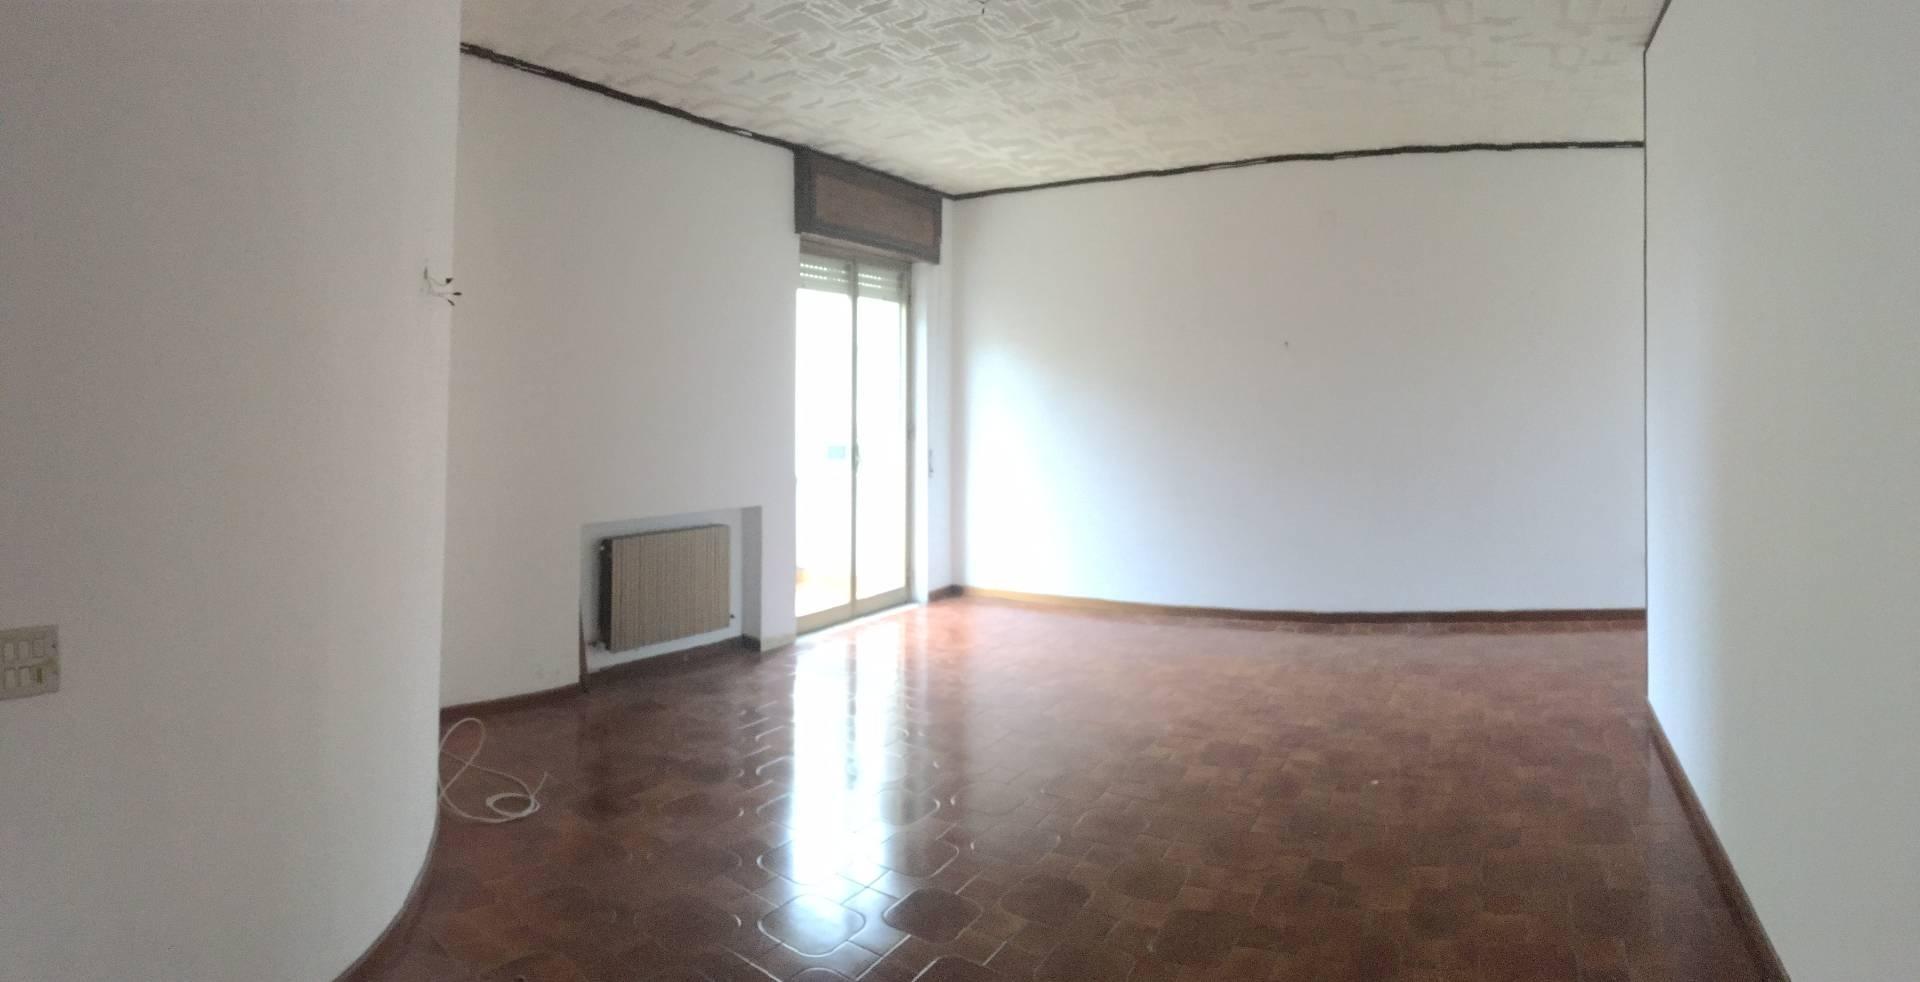 vendita appartamento catanzaro catanzaro sala  165000 euro  4 locali  288 mq